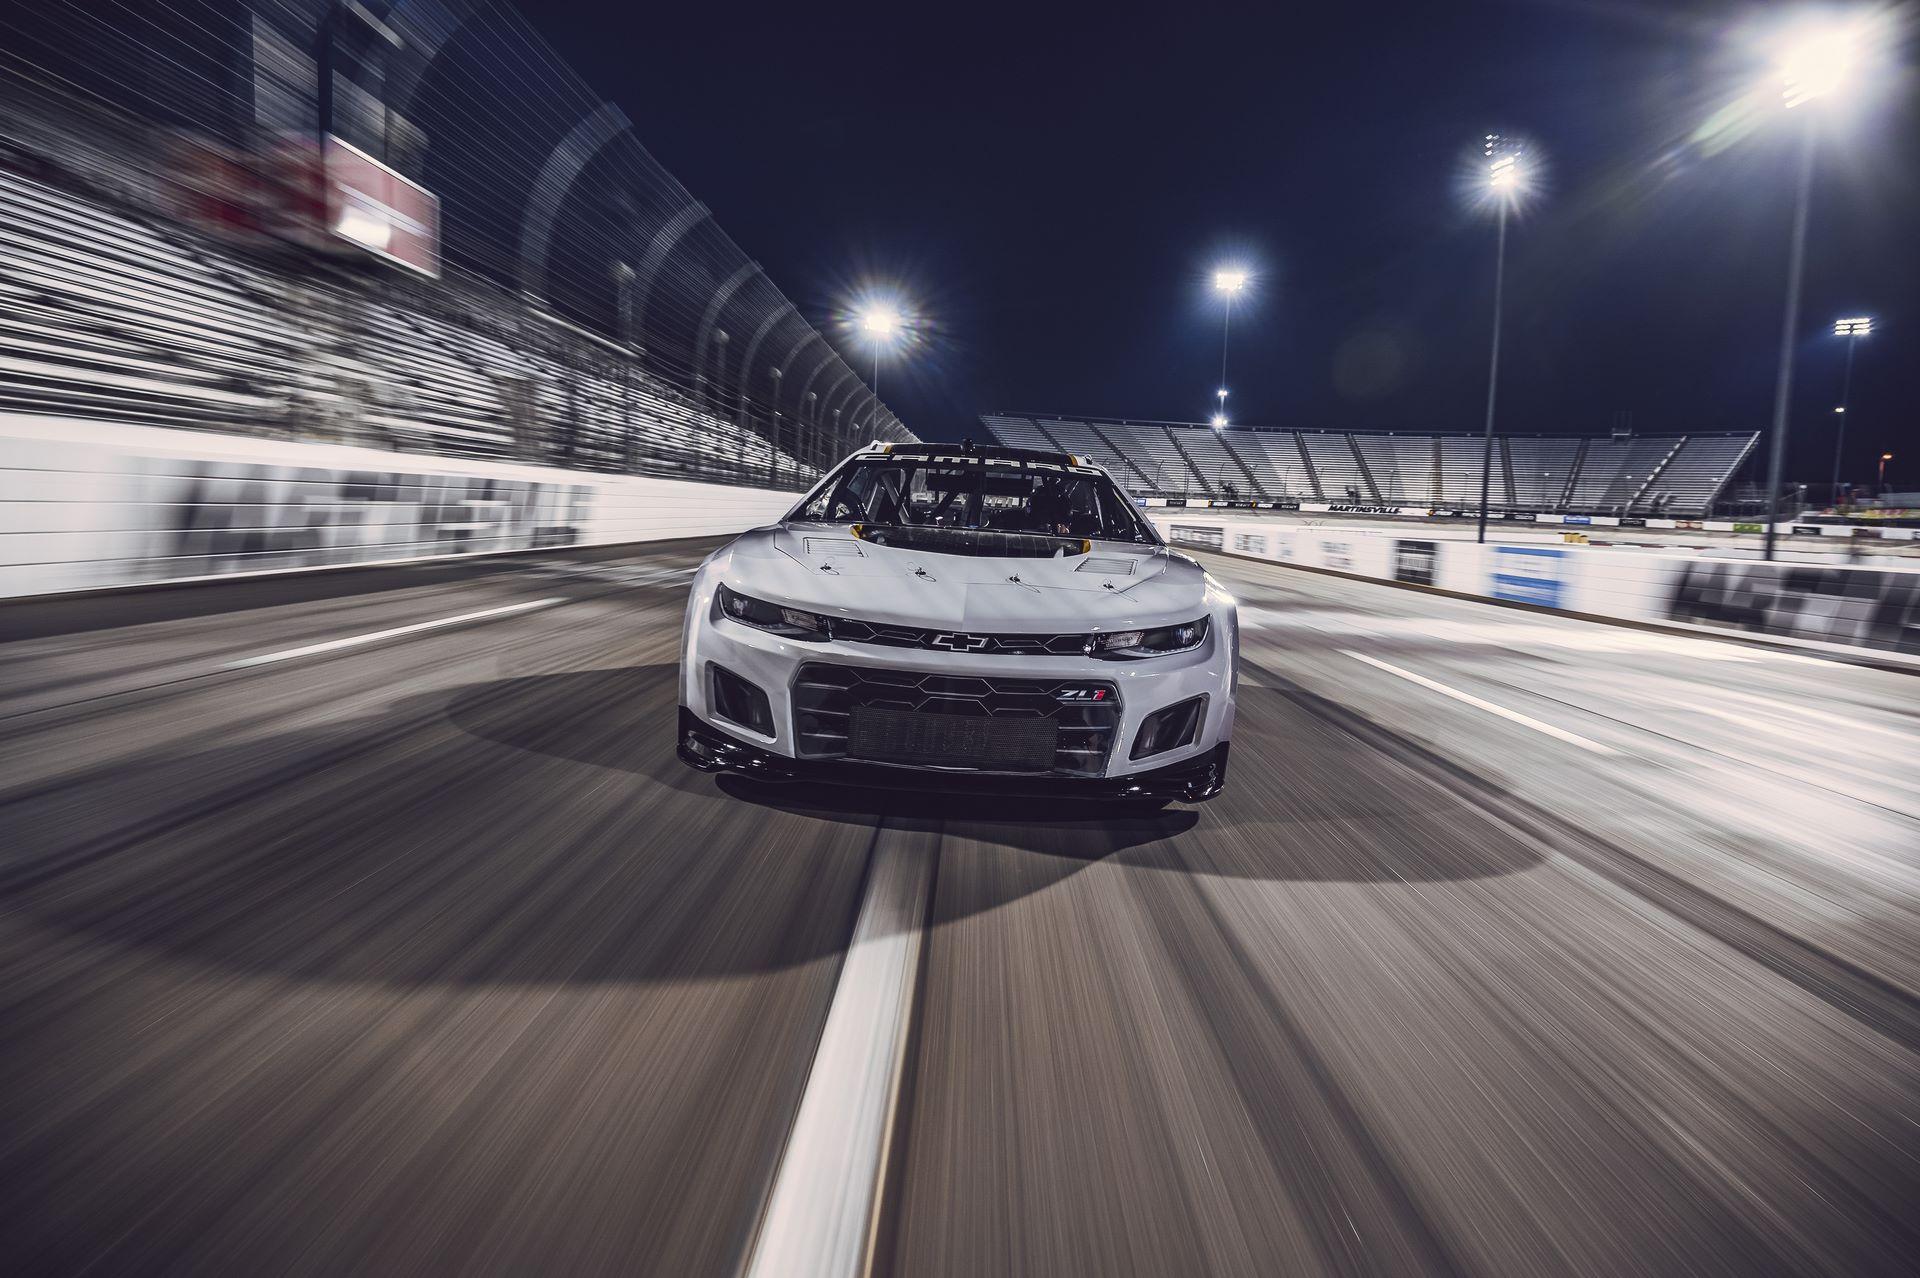 Chevrolet-Camaro-ZL1-RaceCarr-Next-Gen-Nascar-3